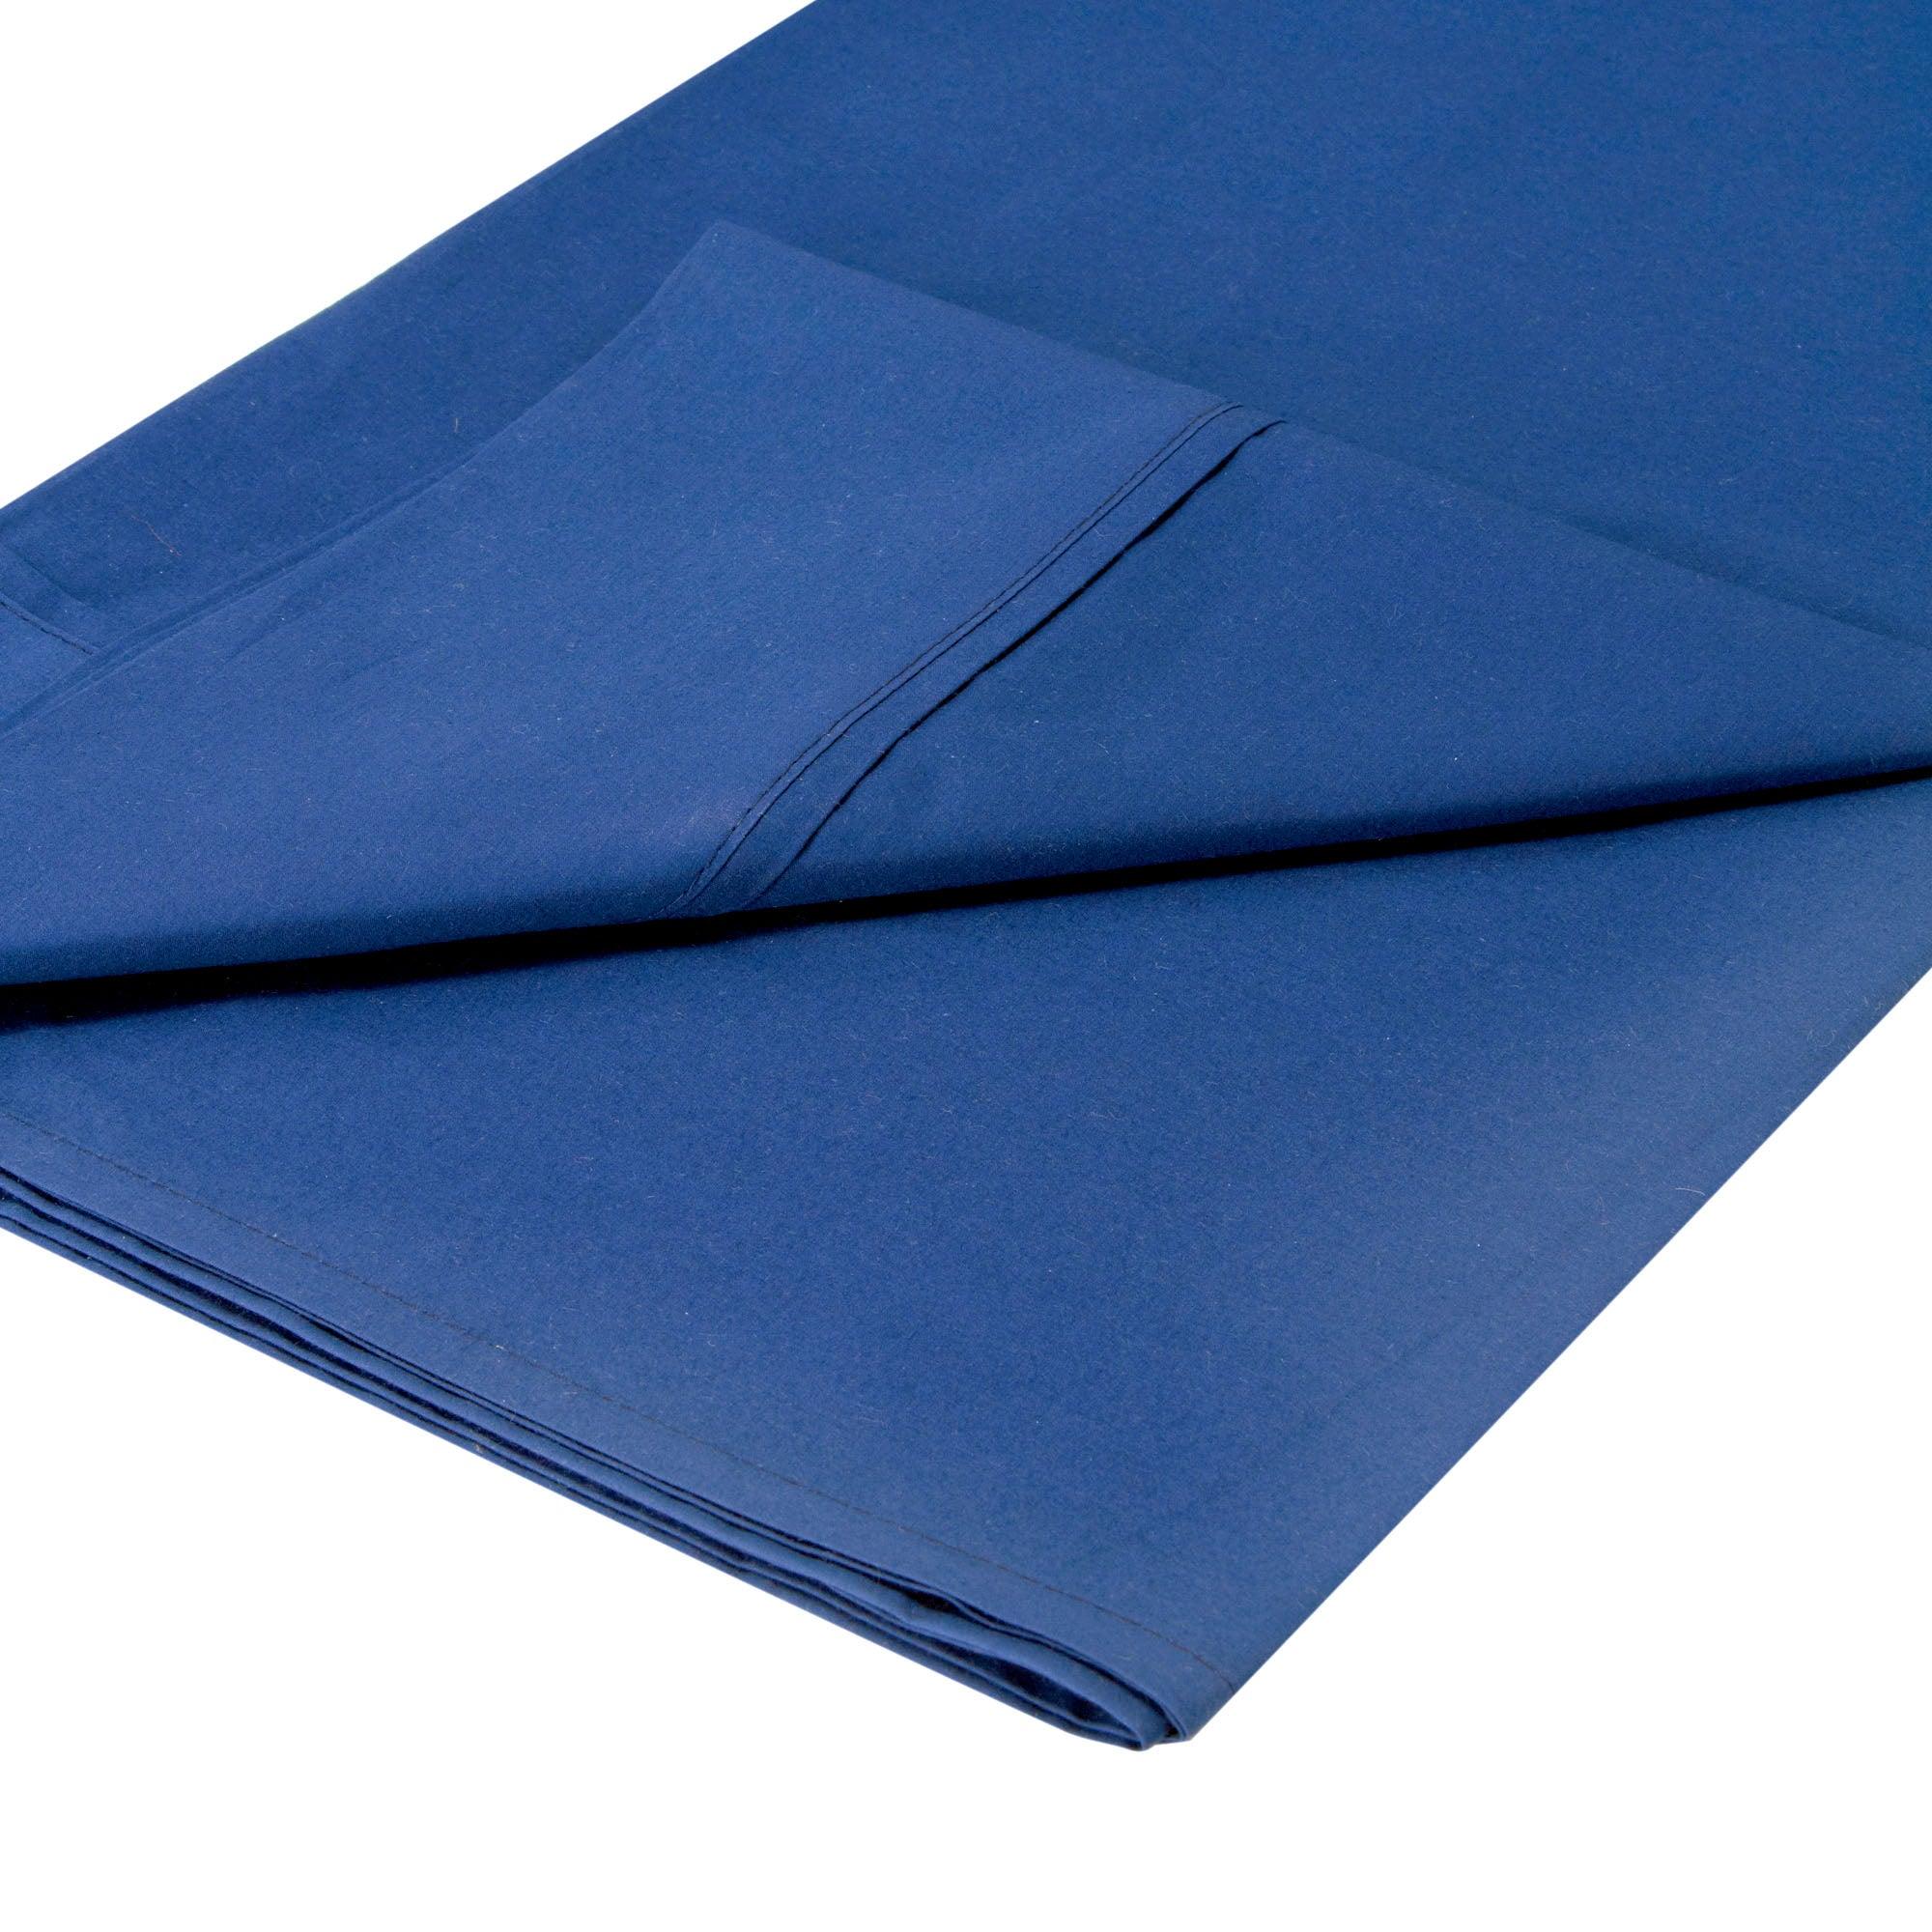 Dorma 300 Thread Count Navy Plain Dye Collection Flat Sheet